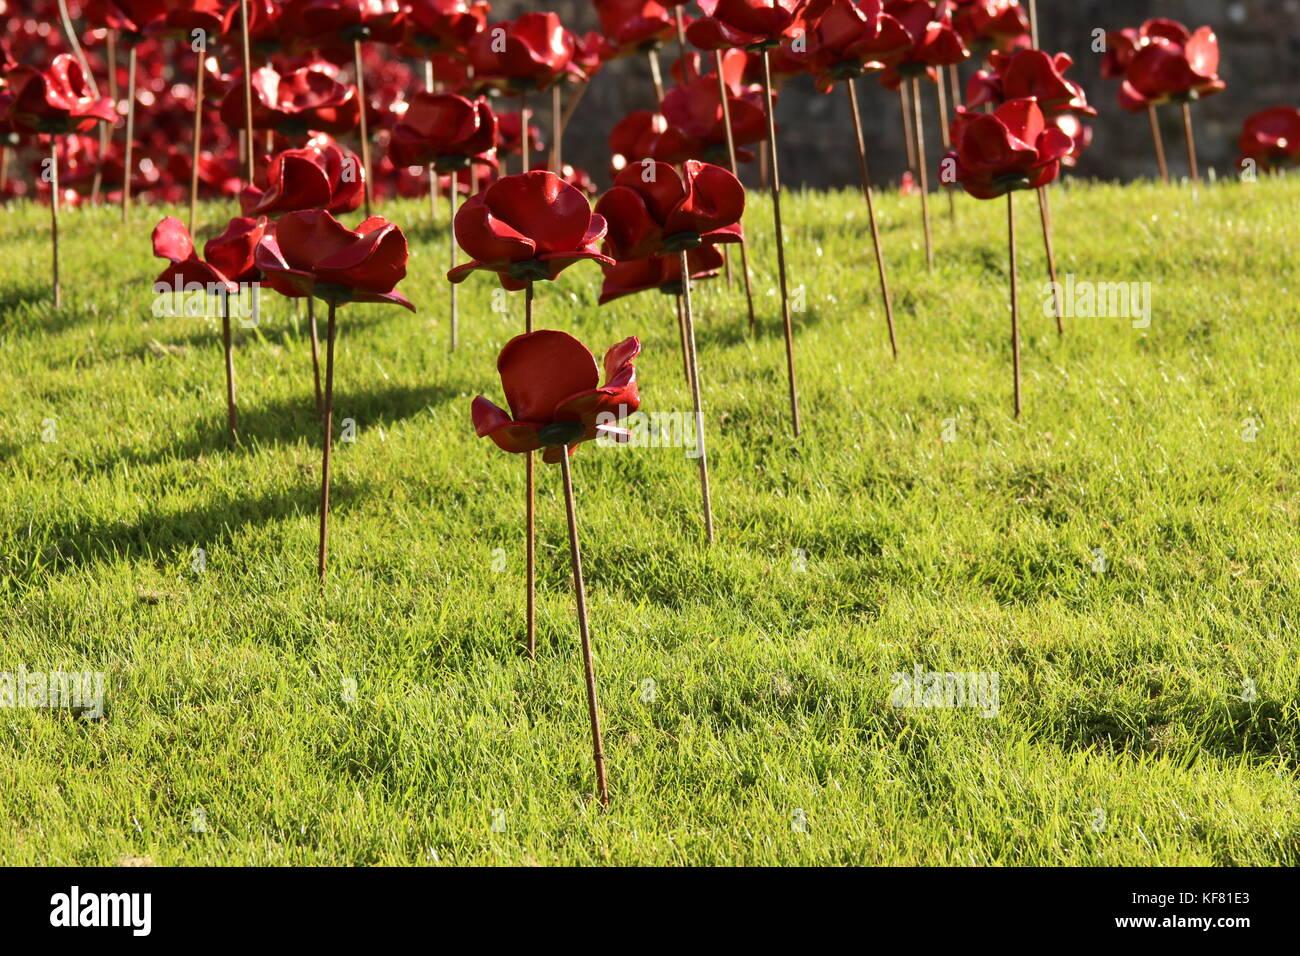 Weep window installation at Caerarfon castle Wales, display ceramic poppies war memorial - Stock Image